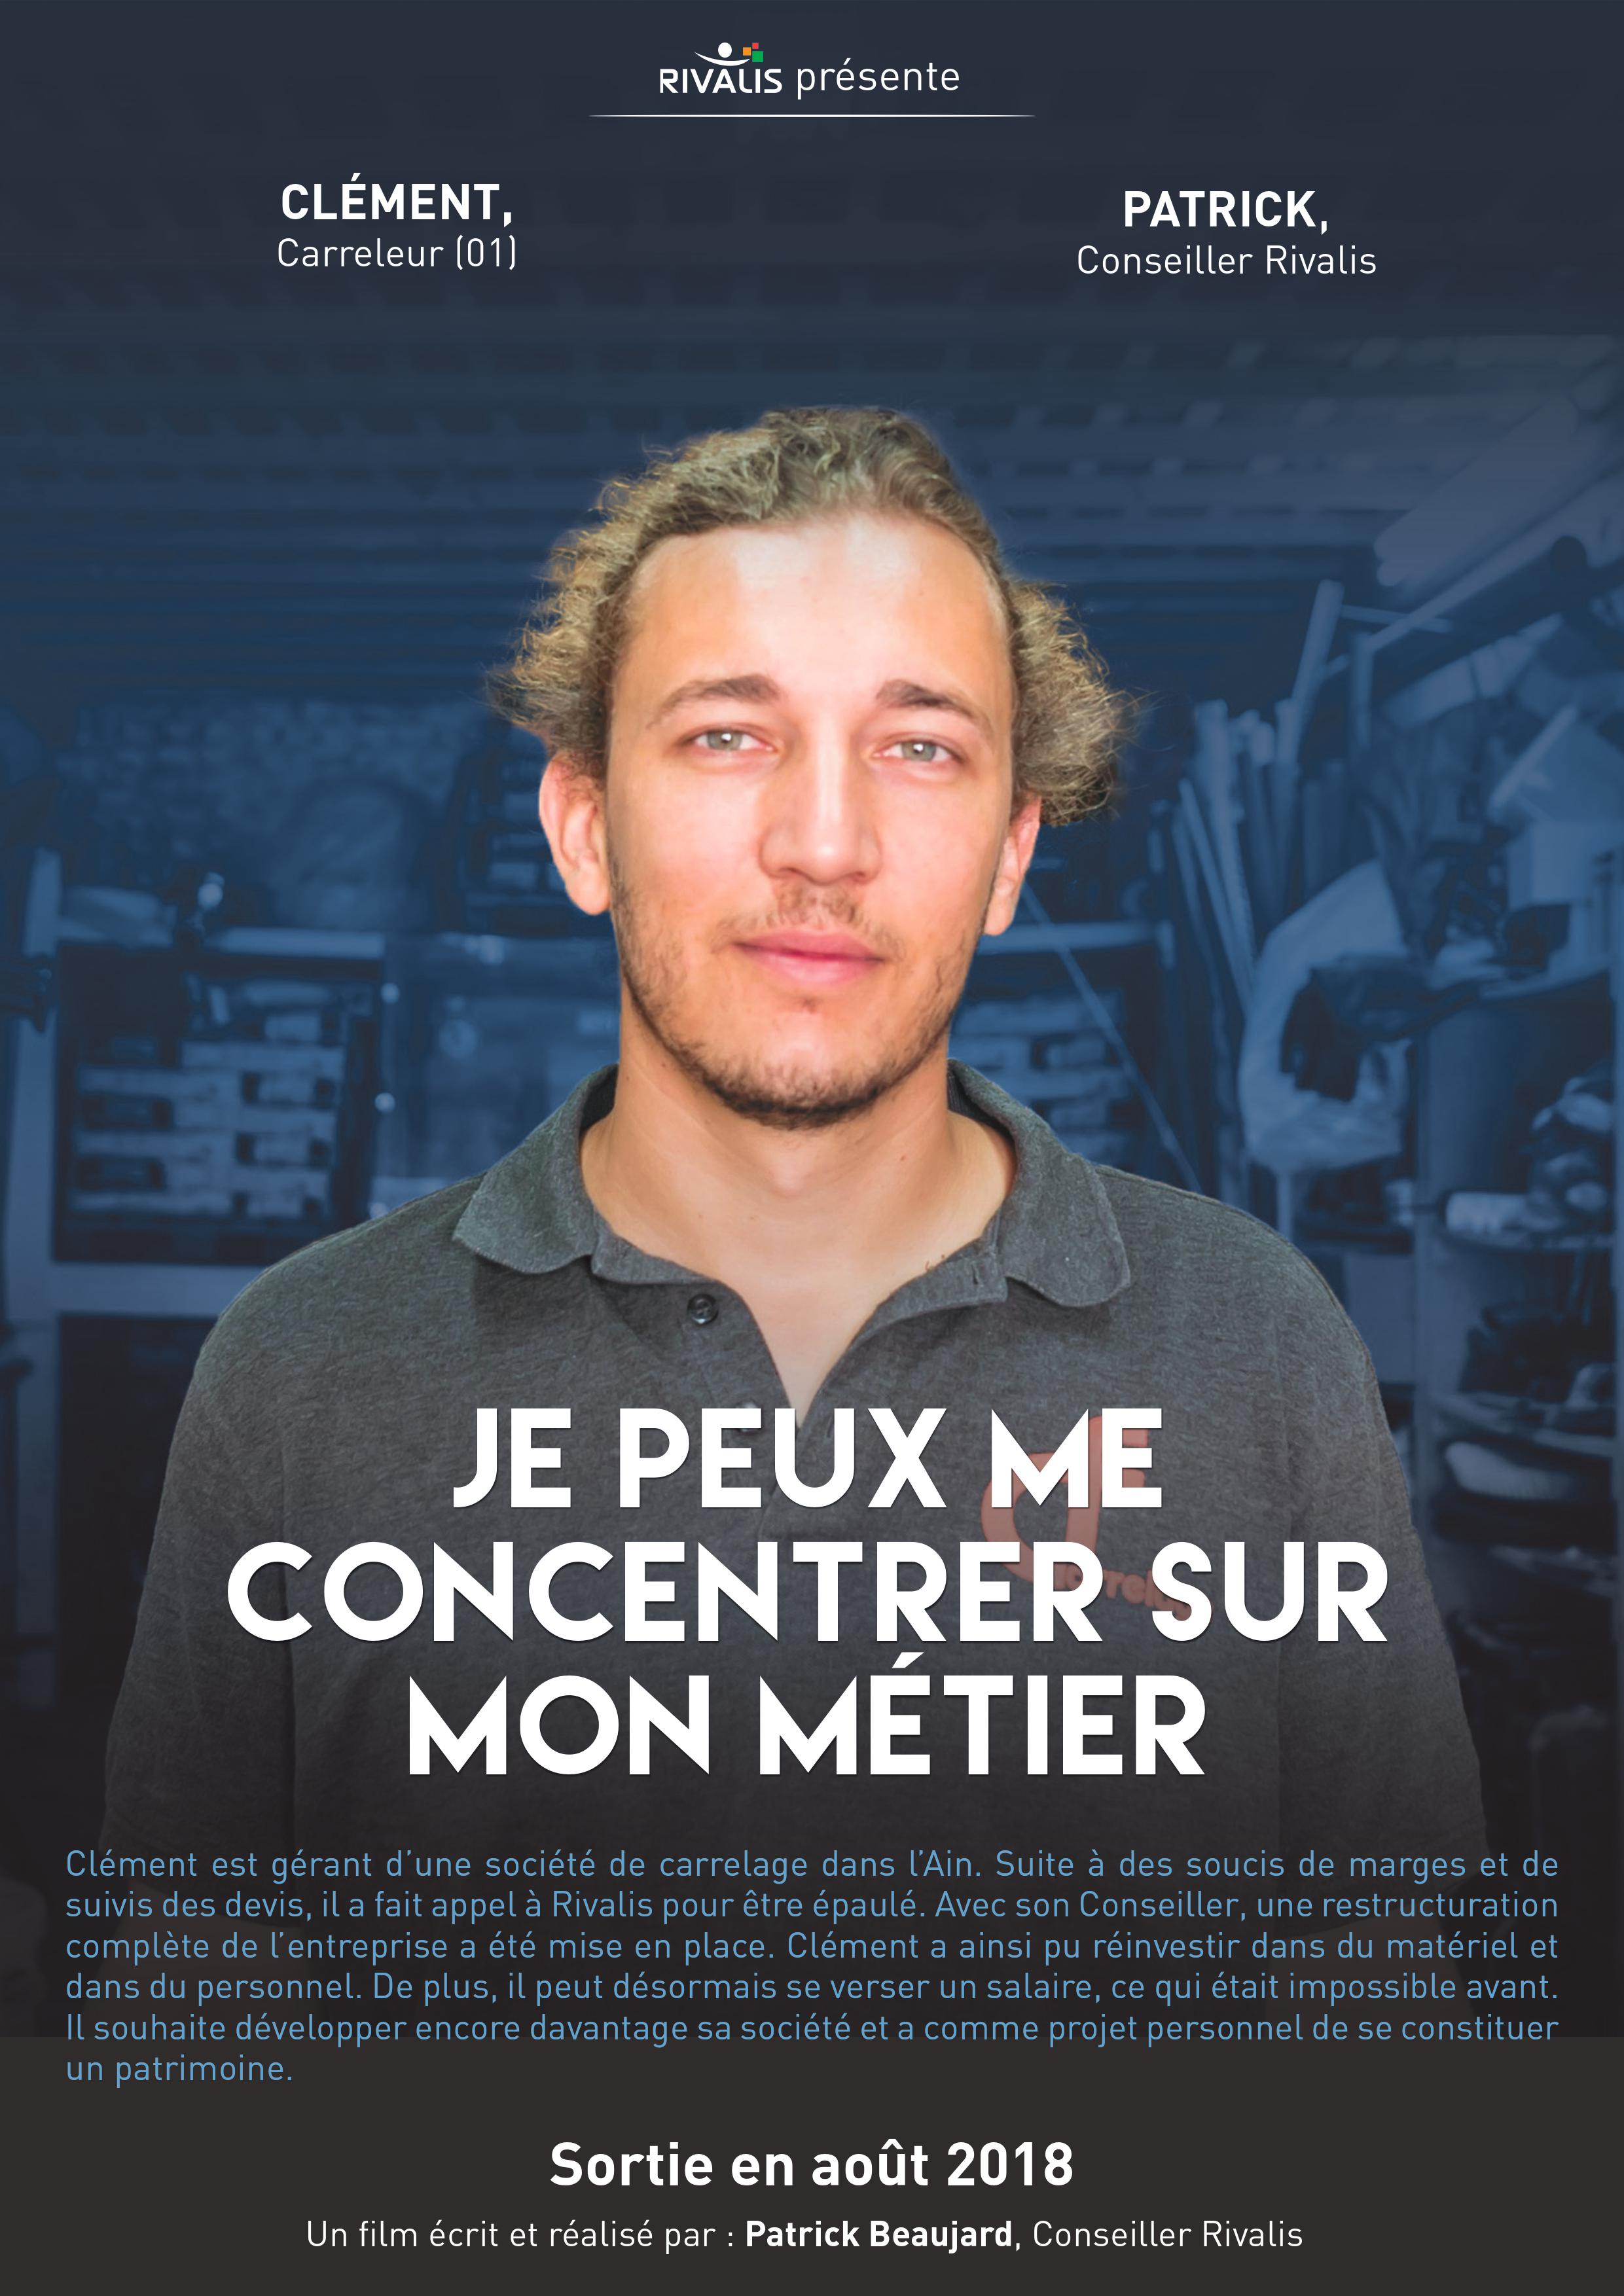 Clément, carreleur